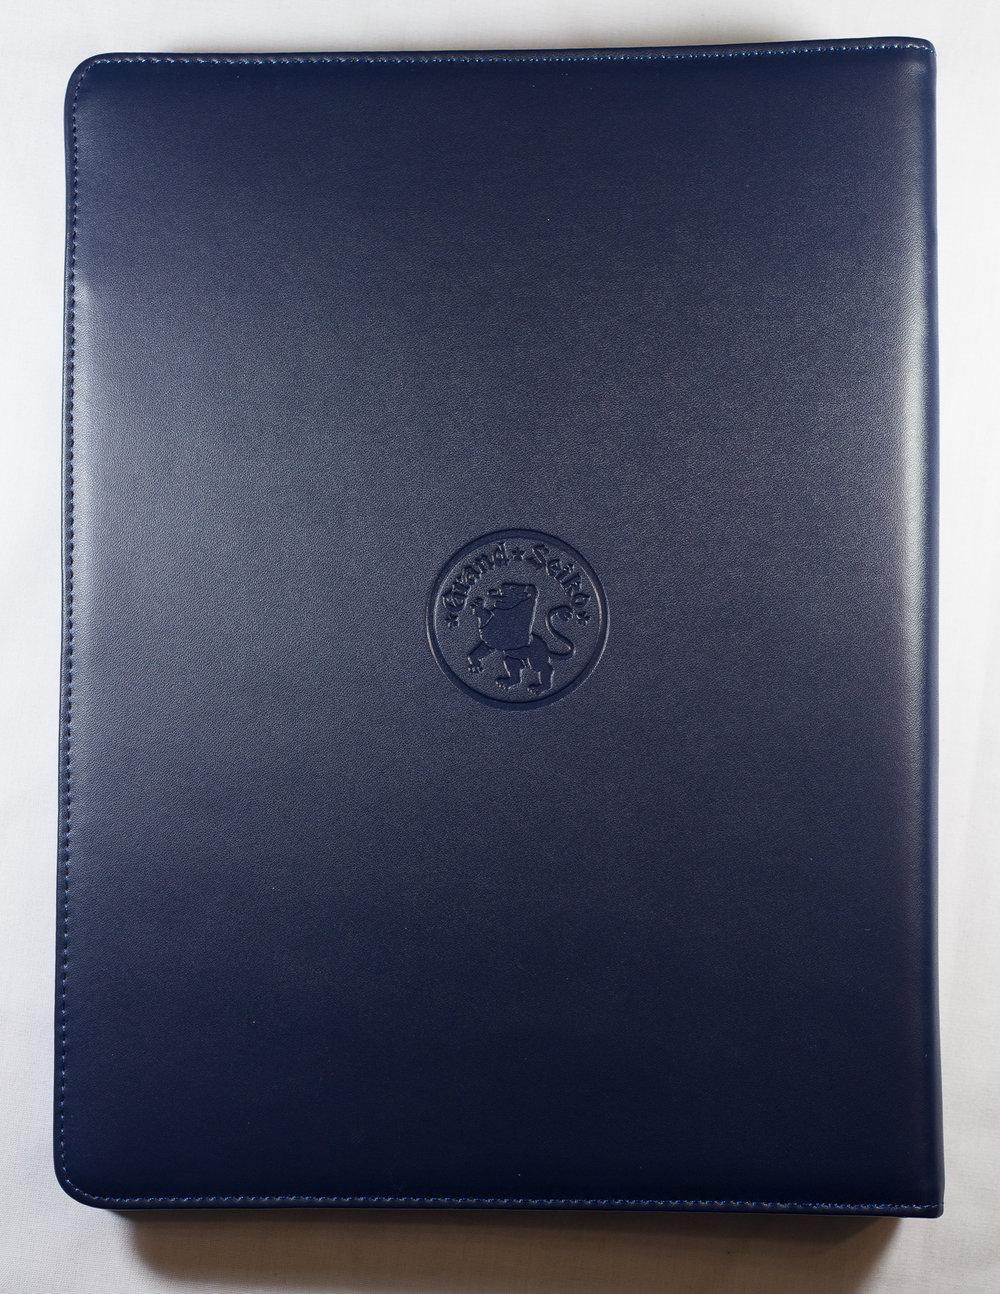 GS dealer folder